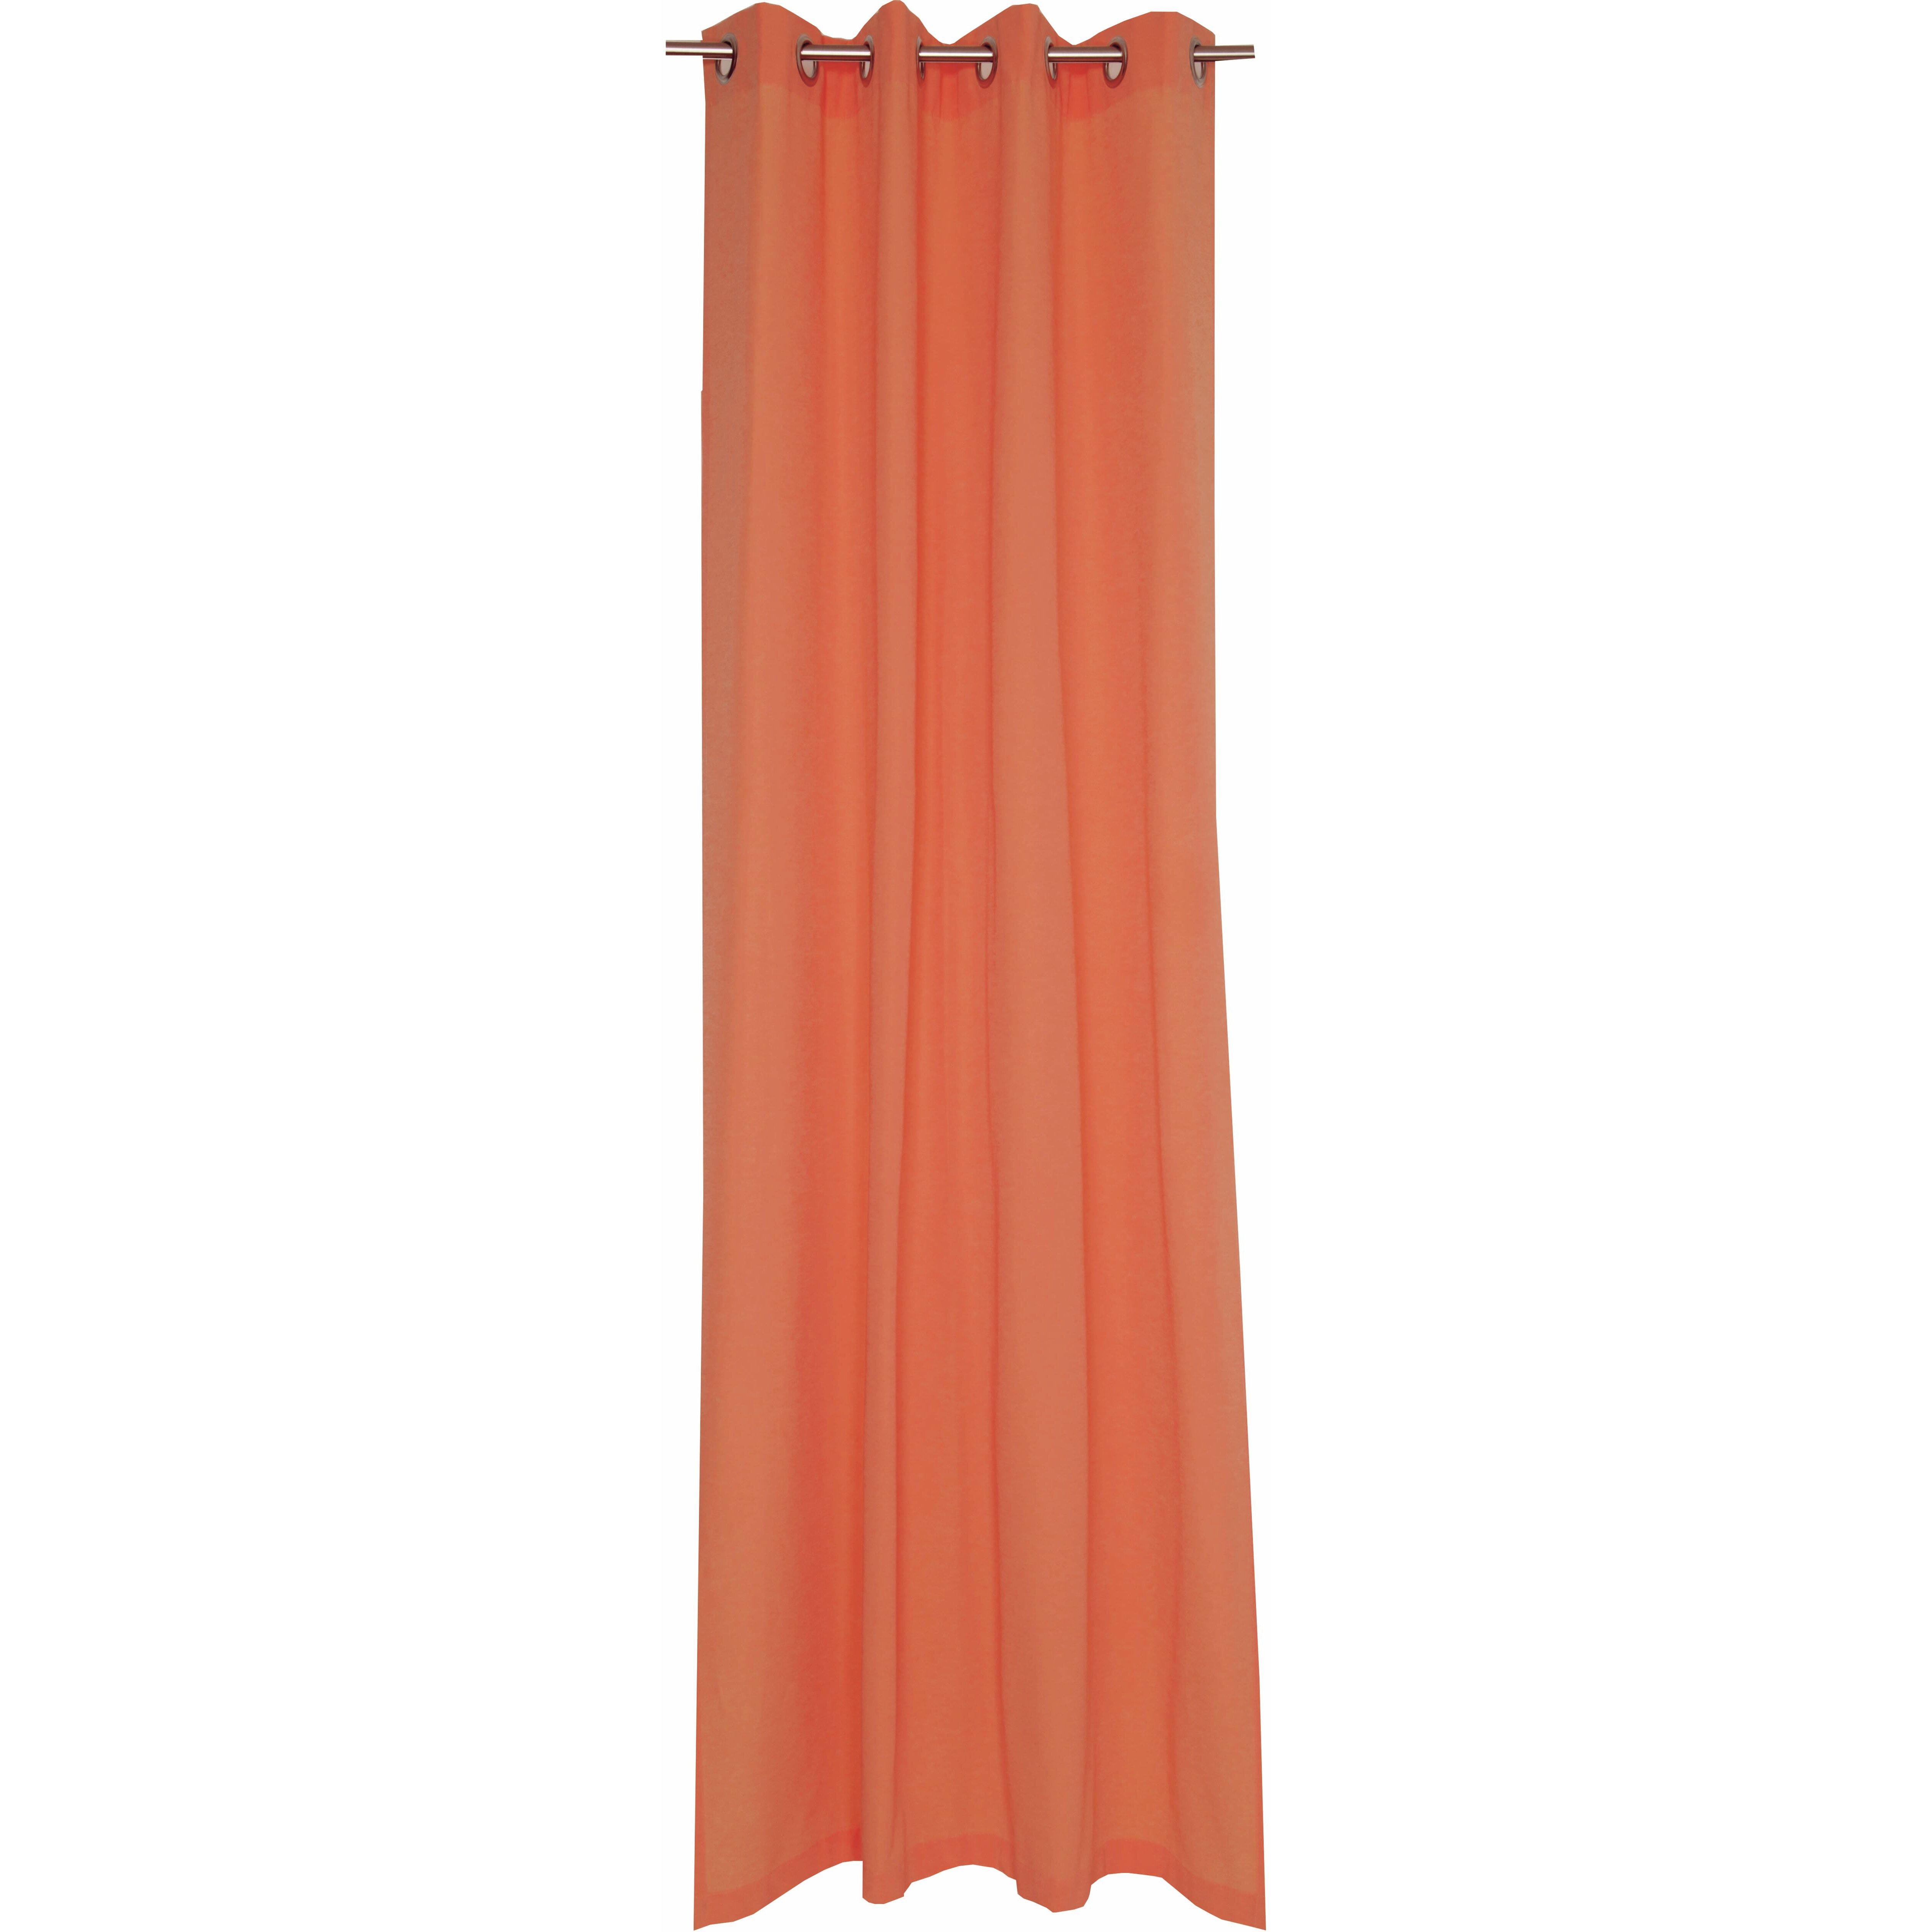 sch ner wohnen mono curtain panel reviews wayfair uk. Black Bedroom Furniture Sets. Home Design Ideas